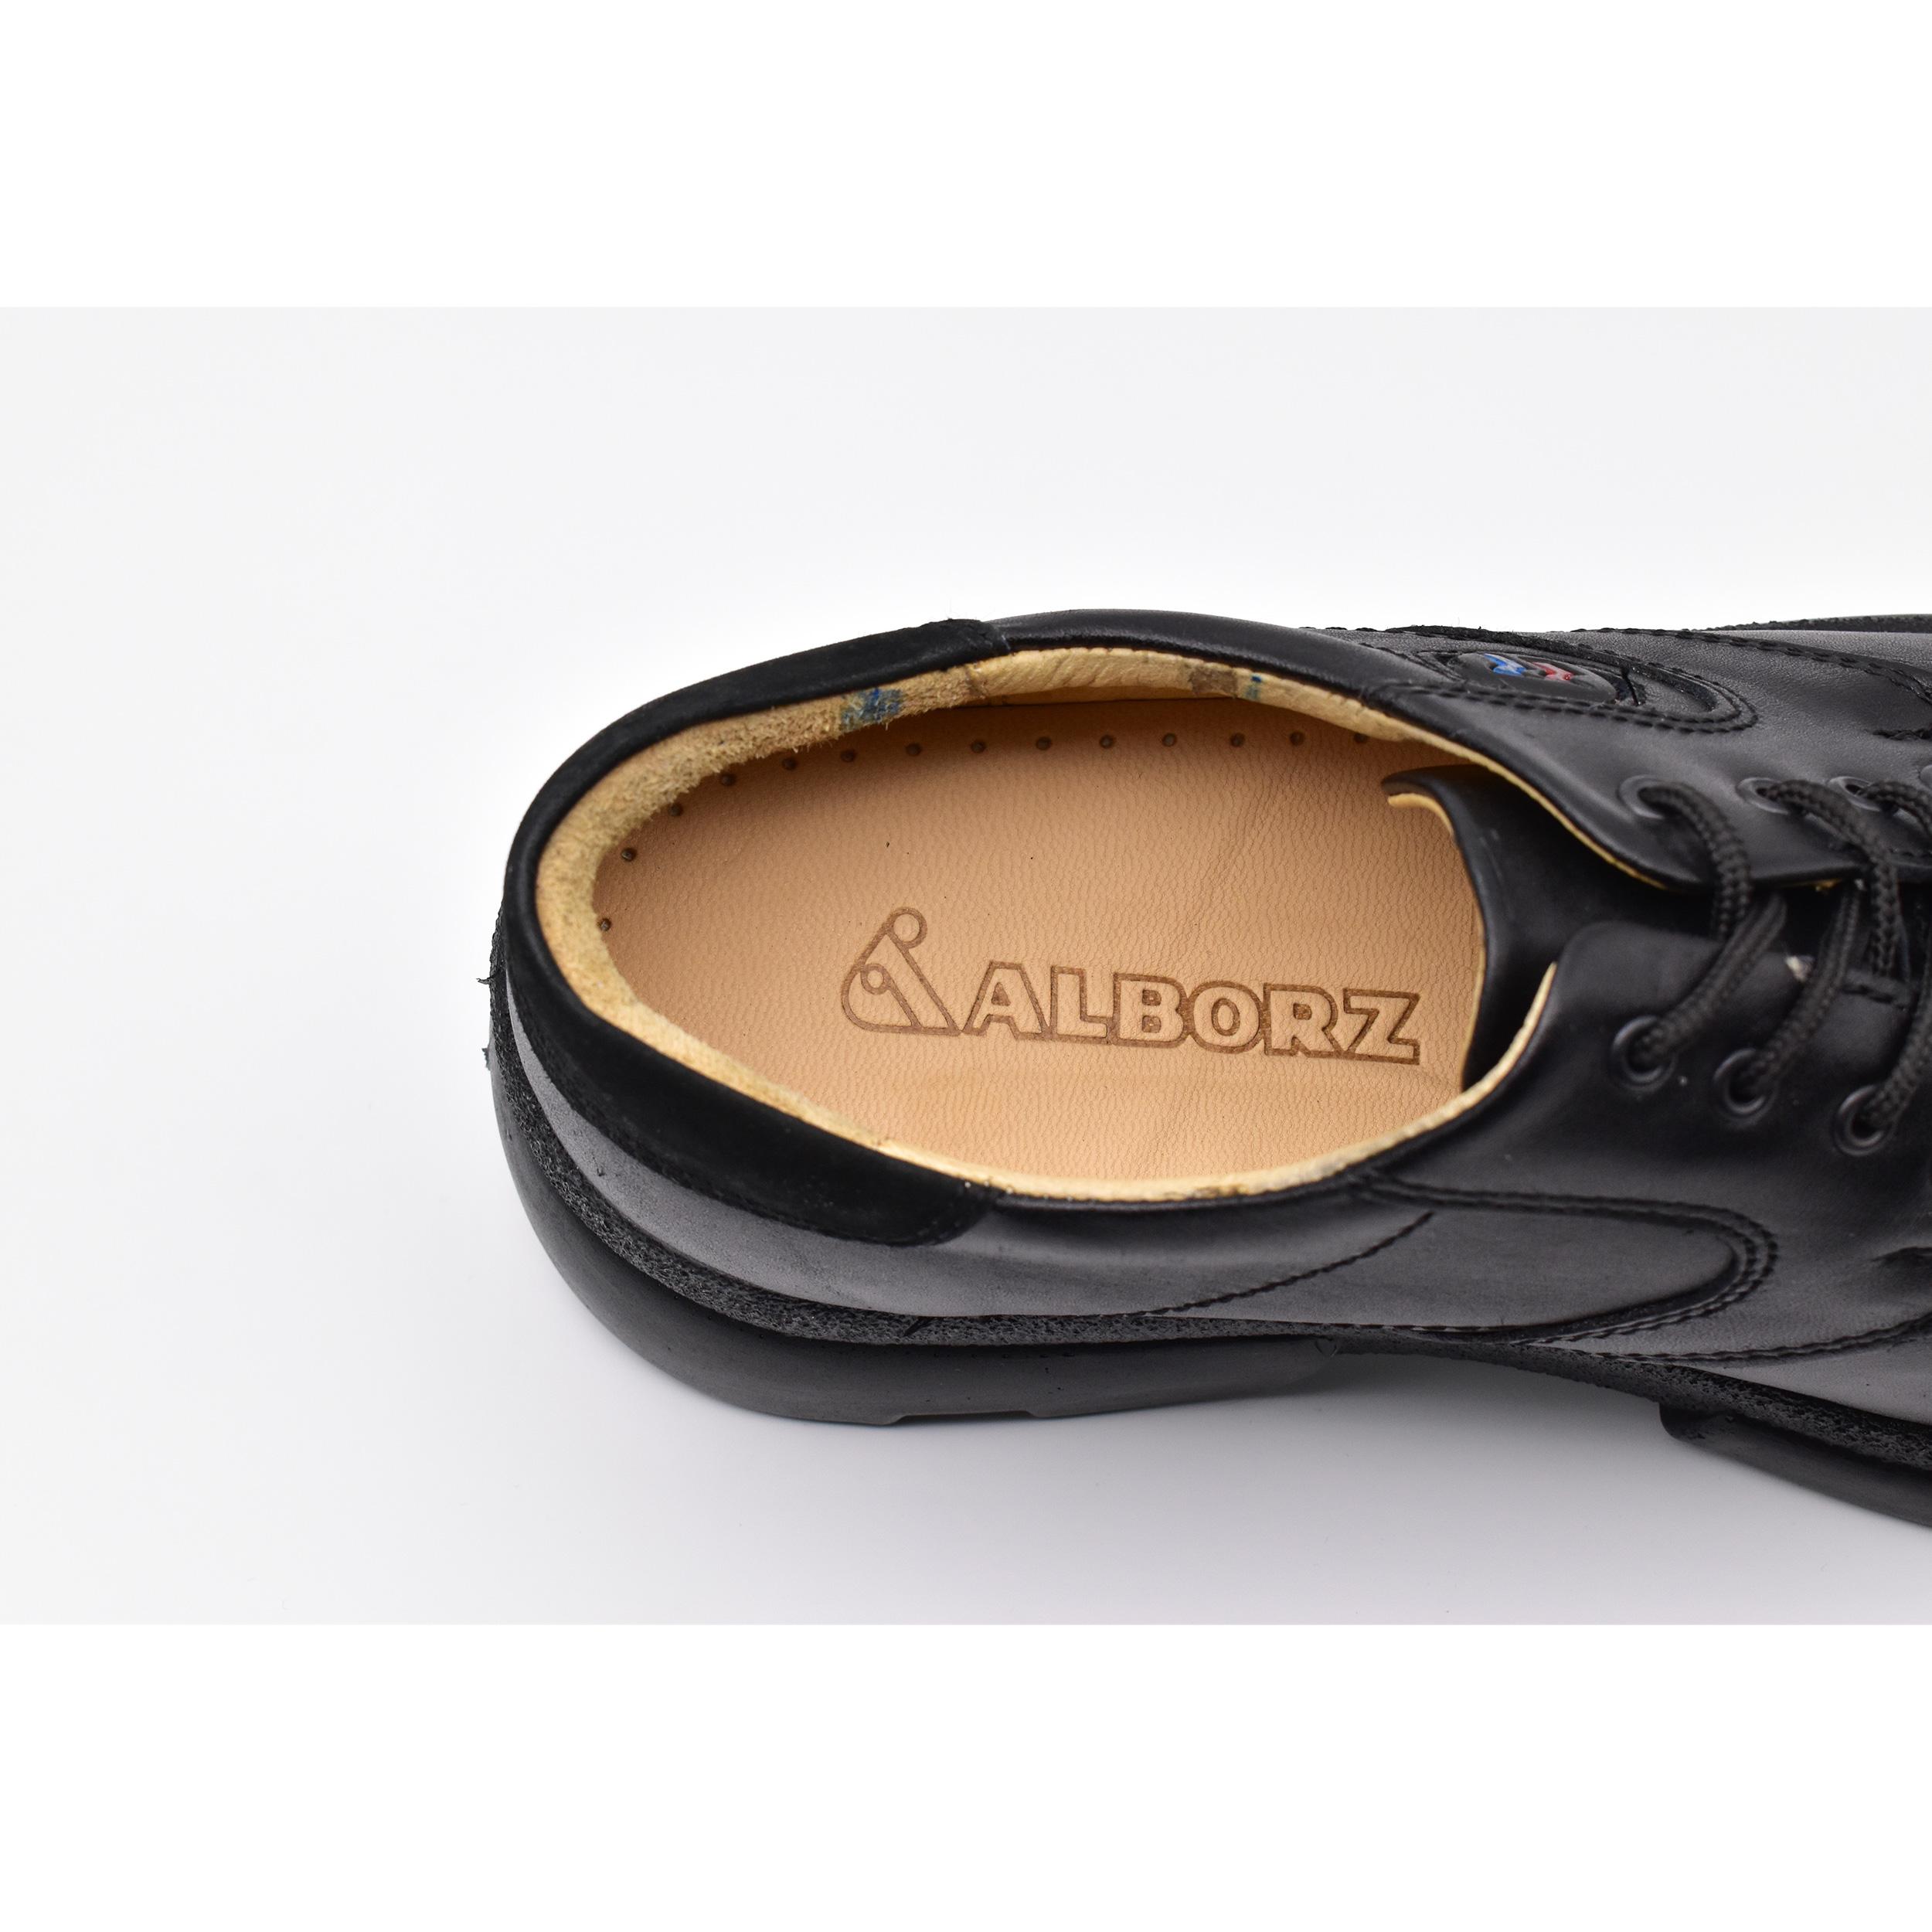 کفش روزمره مردانه البرز مدل تورنتو کد 7009 -  - 7